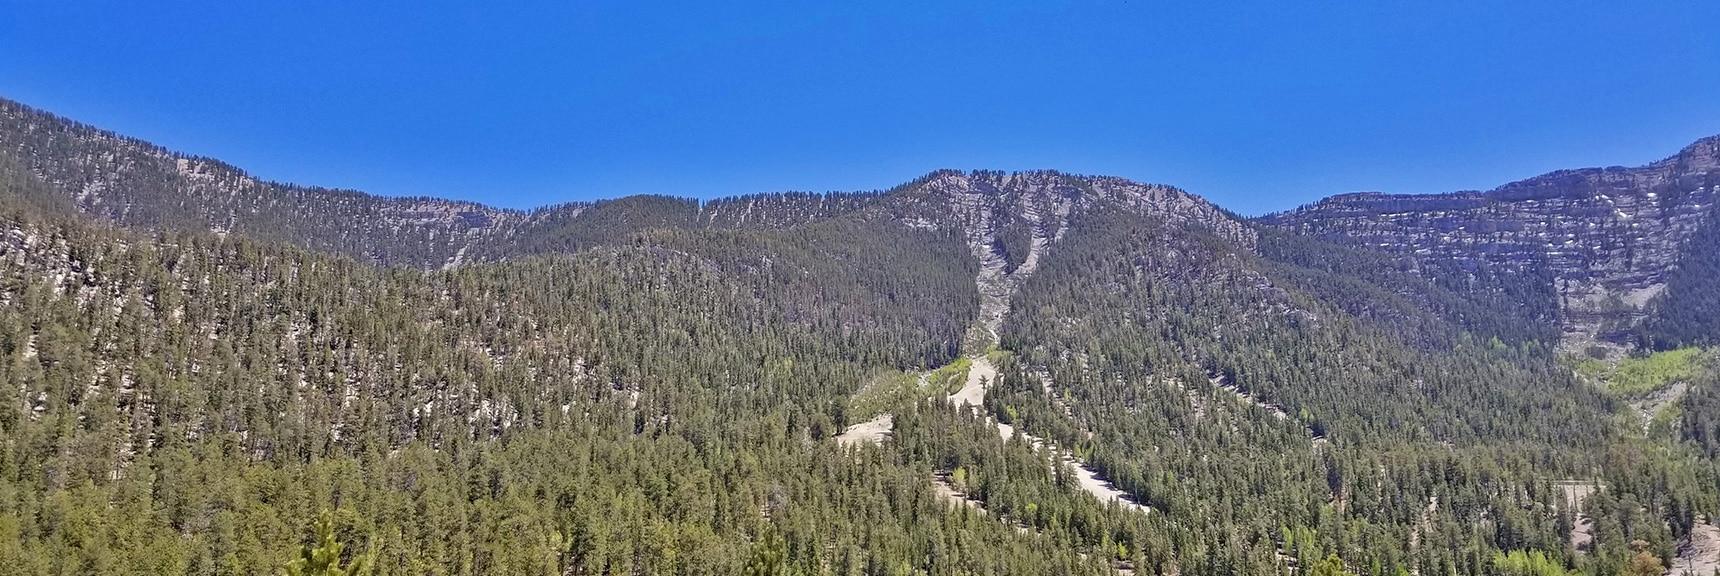 View Down to Lee Canyon Ski Runs and North Rim of Kyle Canyon from Bonanza Trail | Base of McFarland Peak via Bristlecone Pine Trail and Bonanza Trail | Lee Canyon | Spring Mountains, Nevada